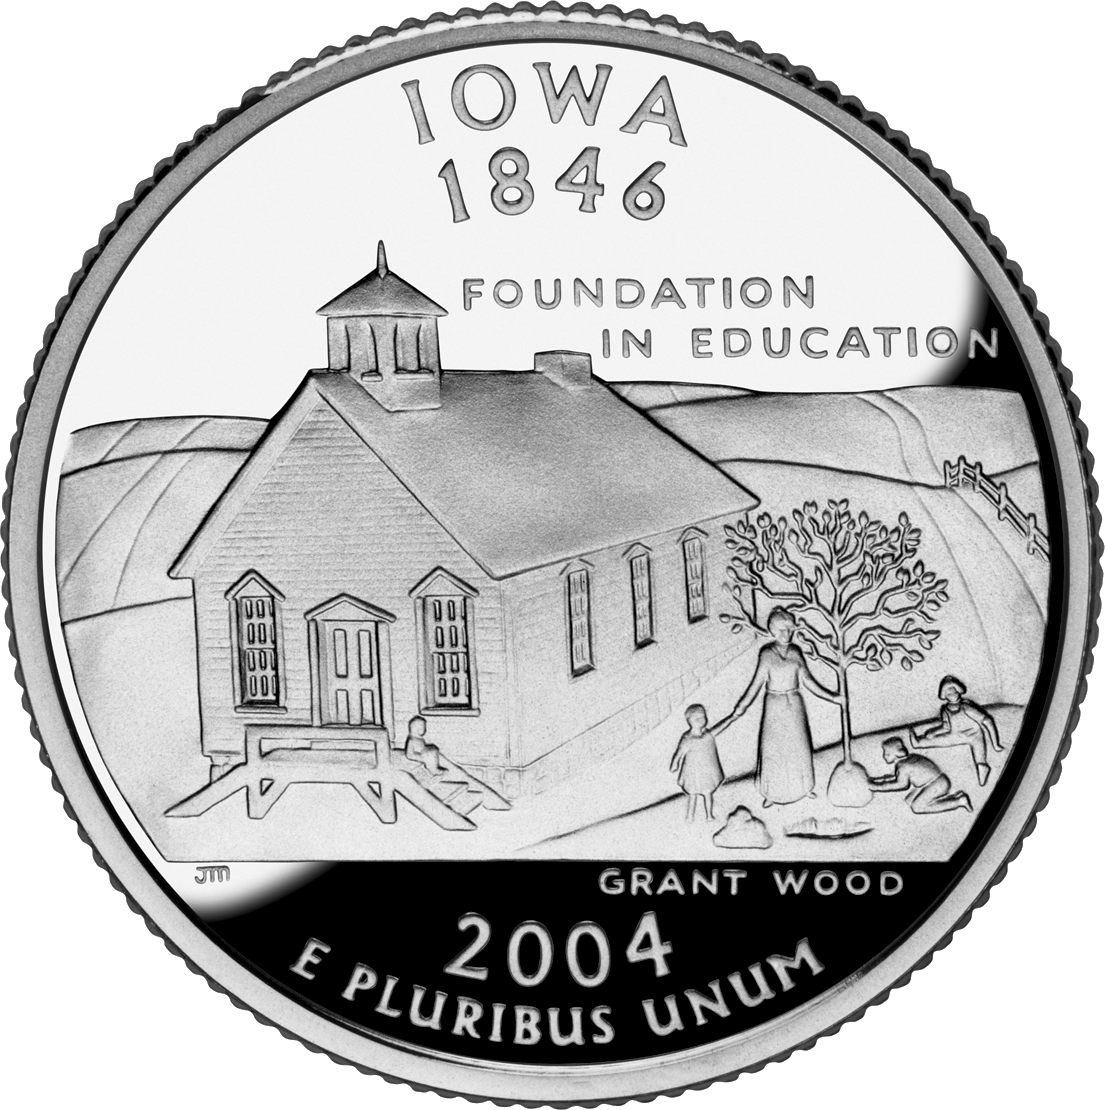 Iowa's state quarter